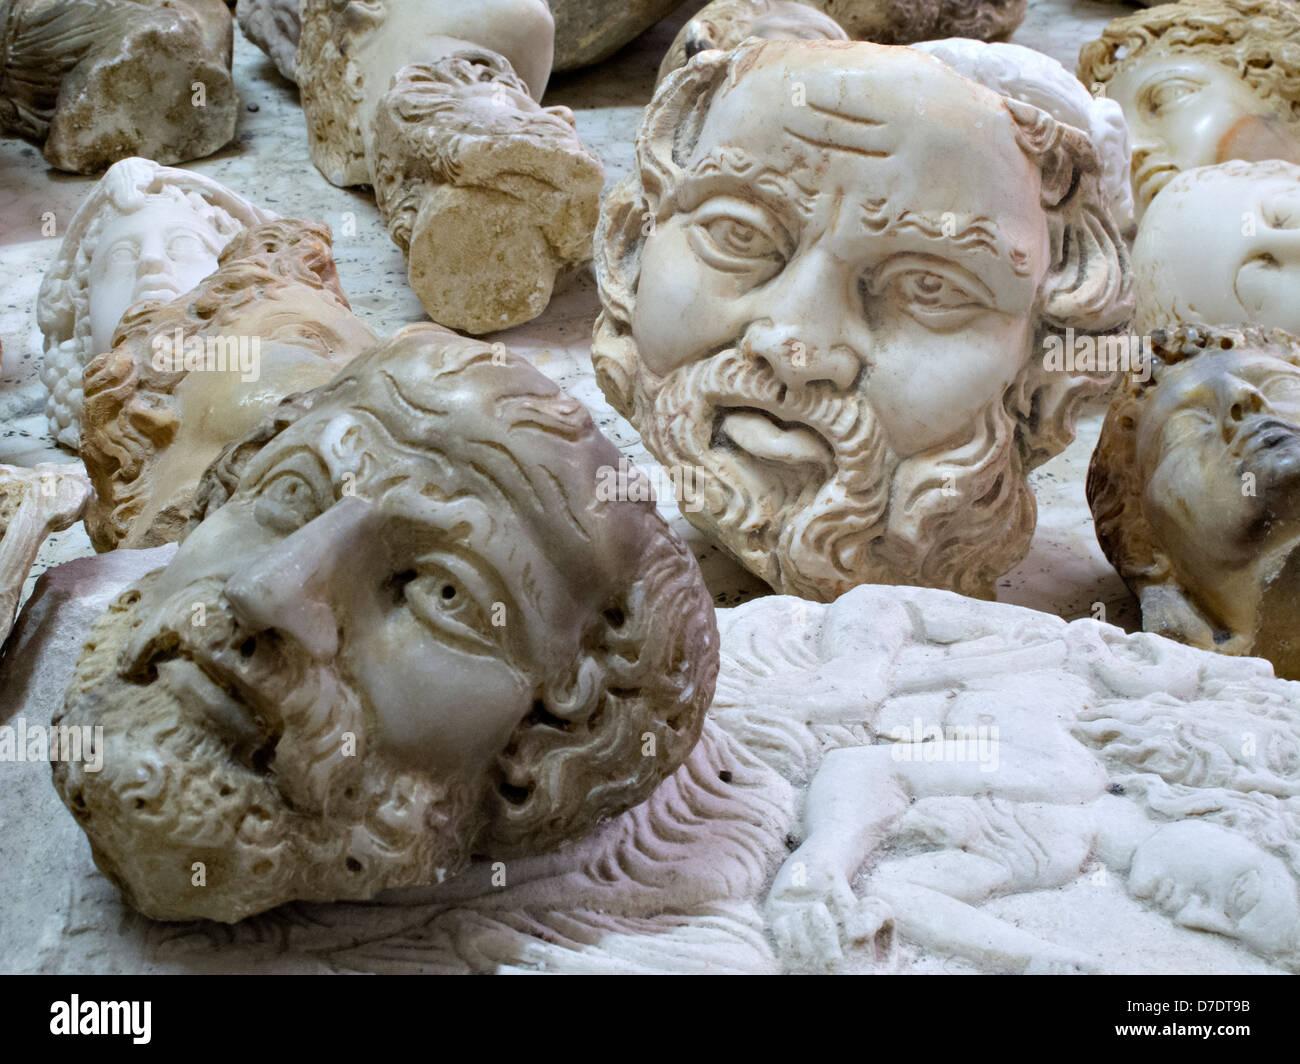 Imitation busts of historic personalities, Antakya, Turkey - Stock Image